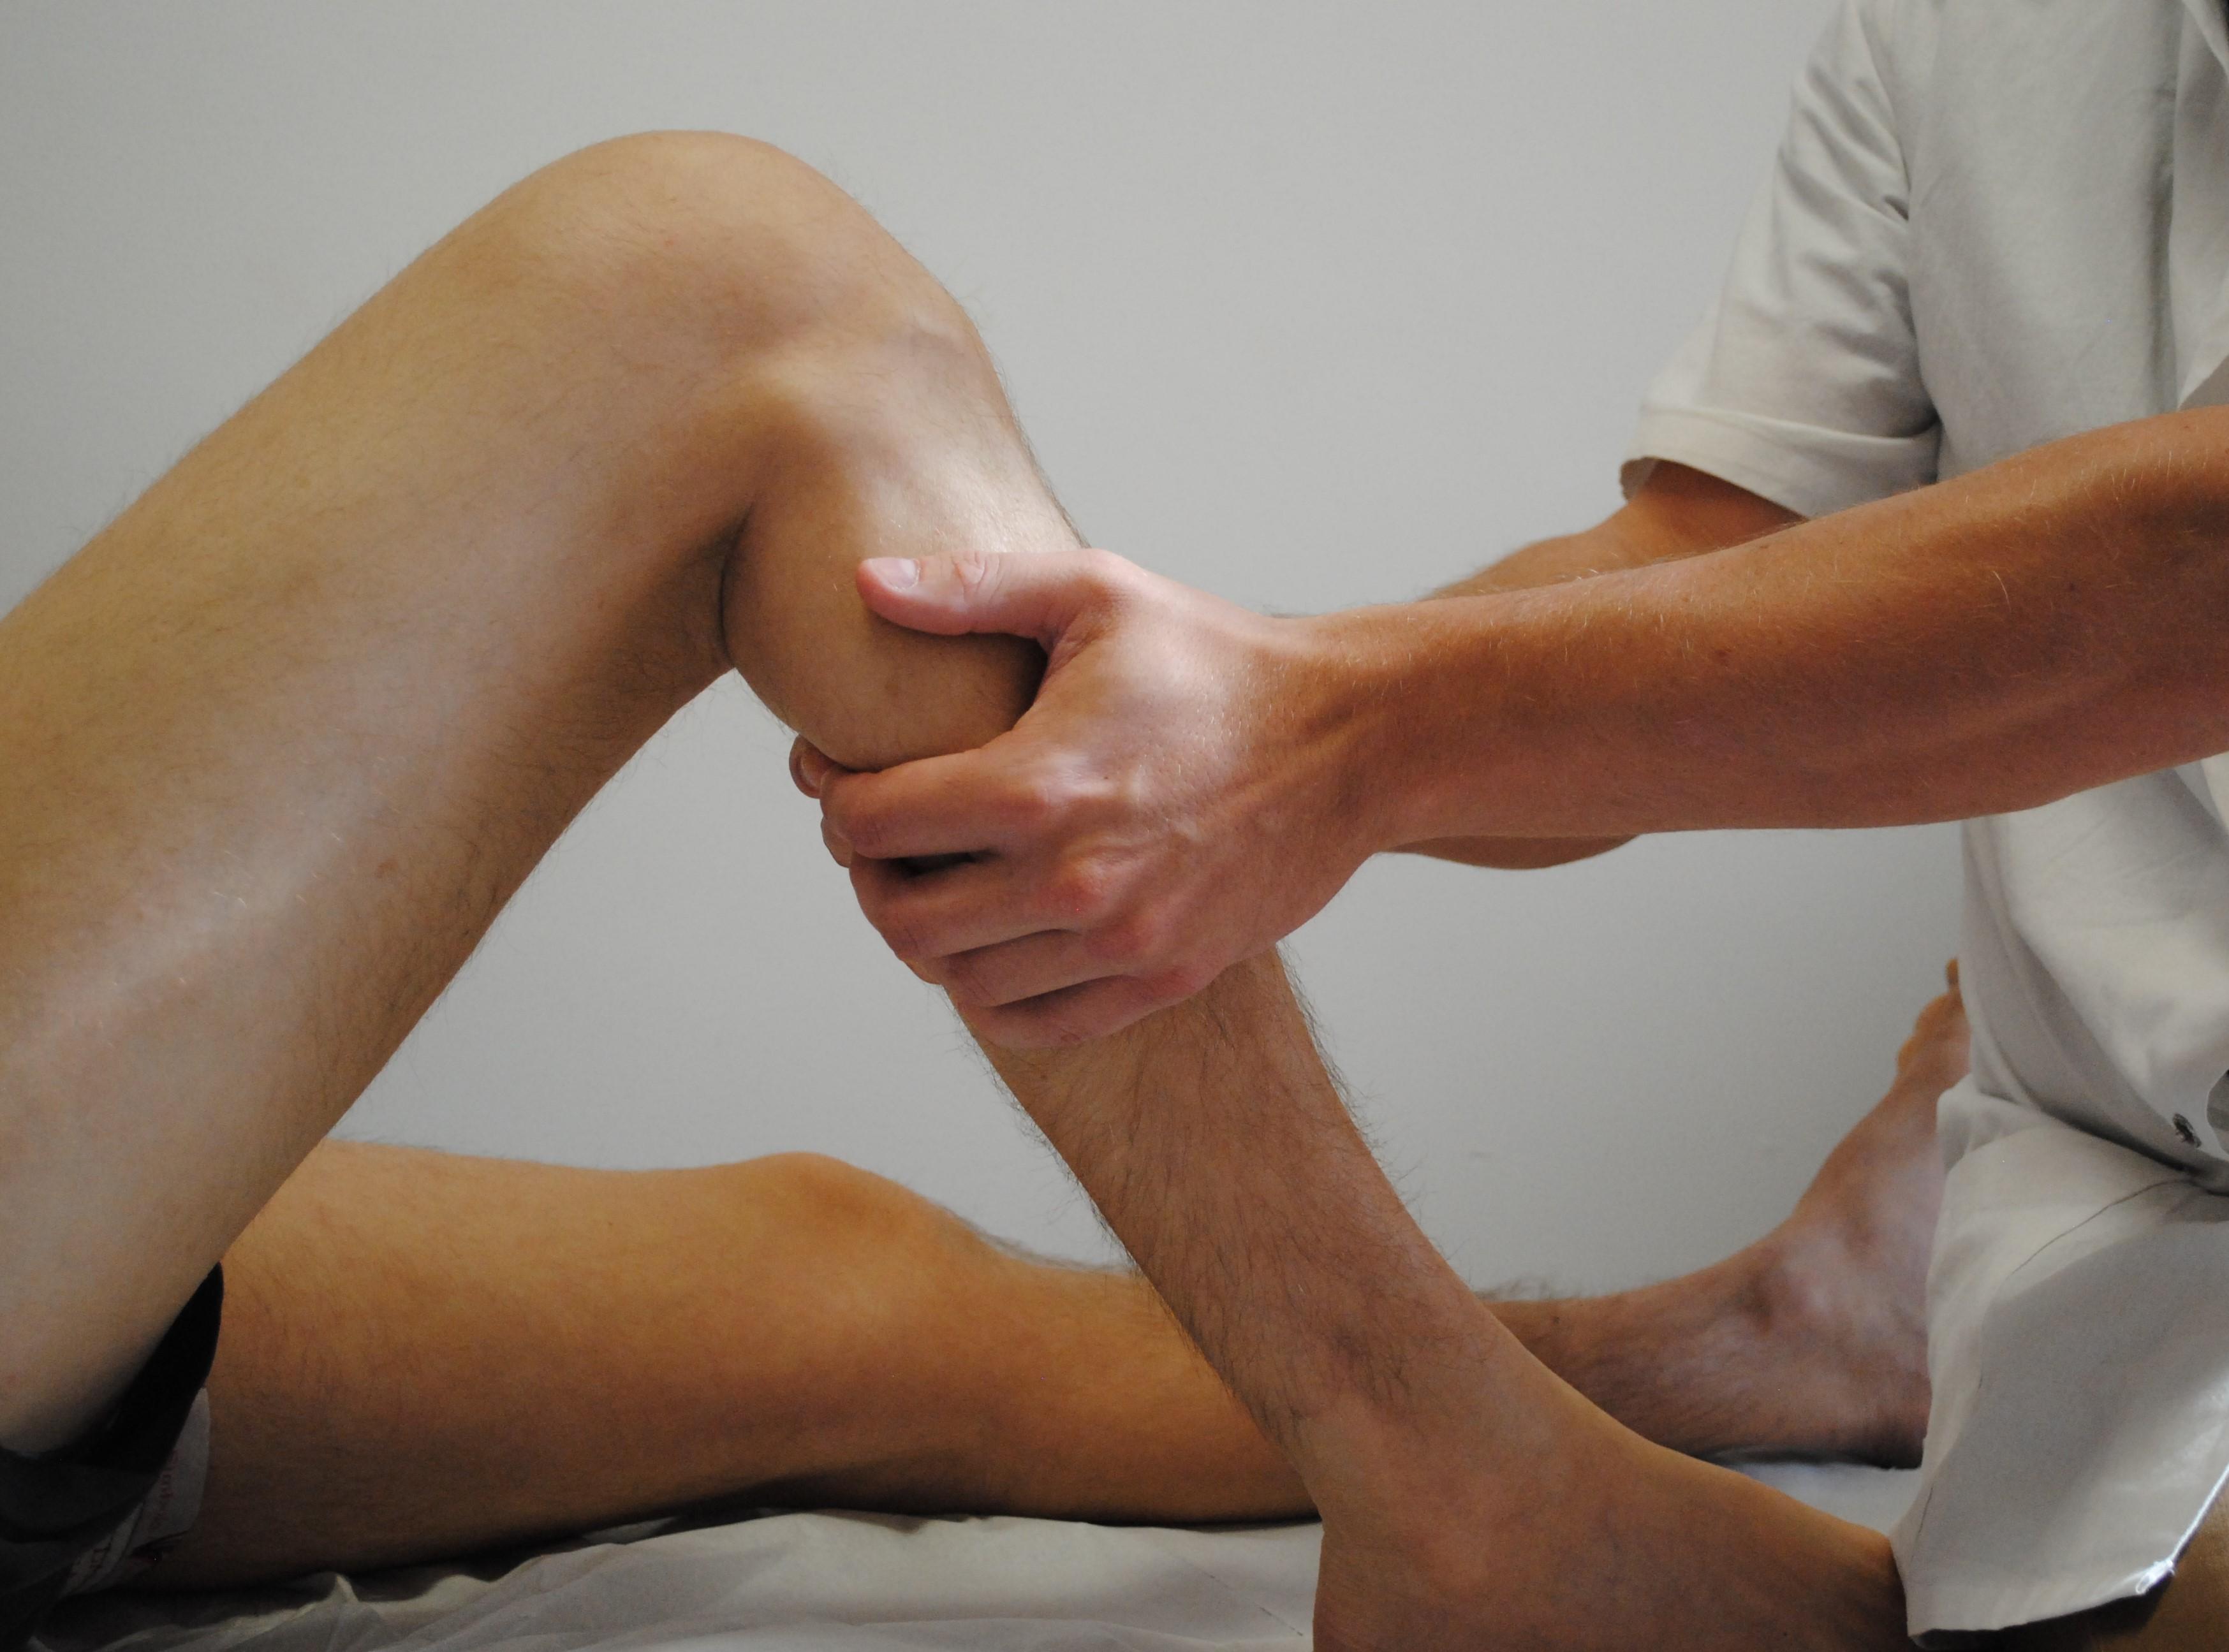 ostéopathie musculo squelettique